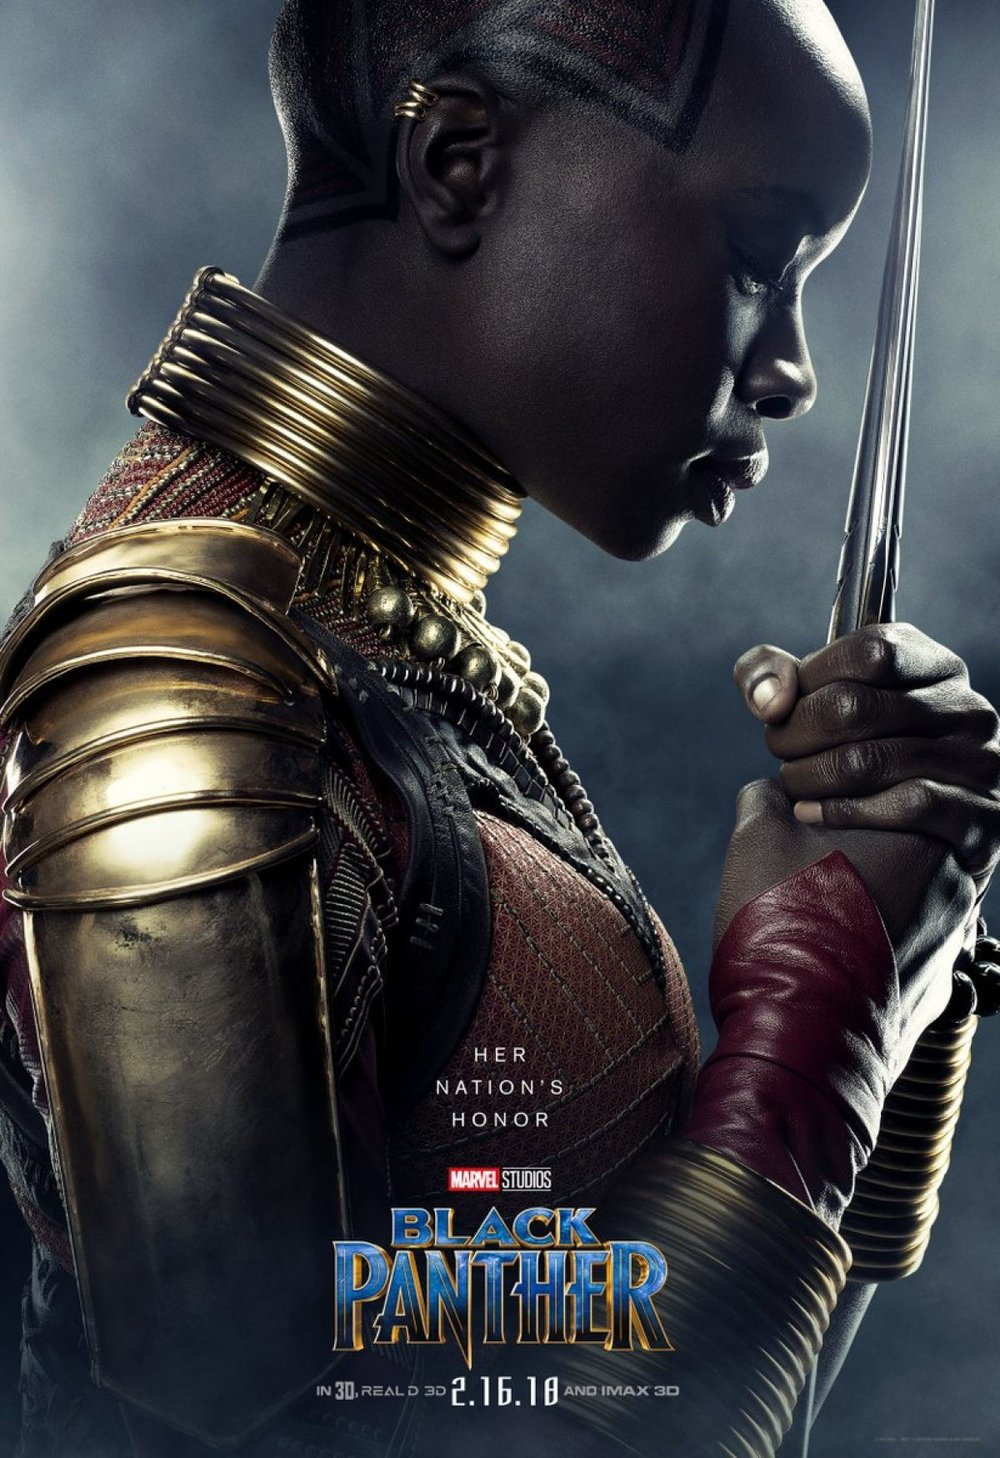 Black-Panther-Poster-2_1200_1750_81_s.jpg